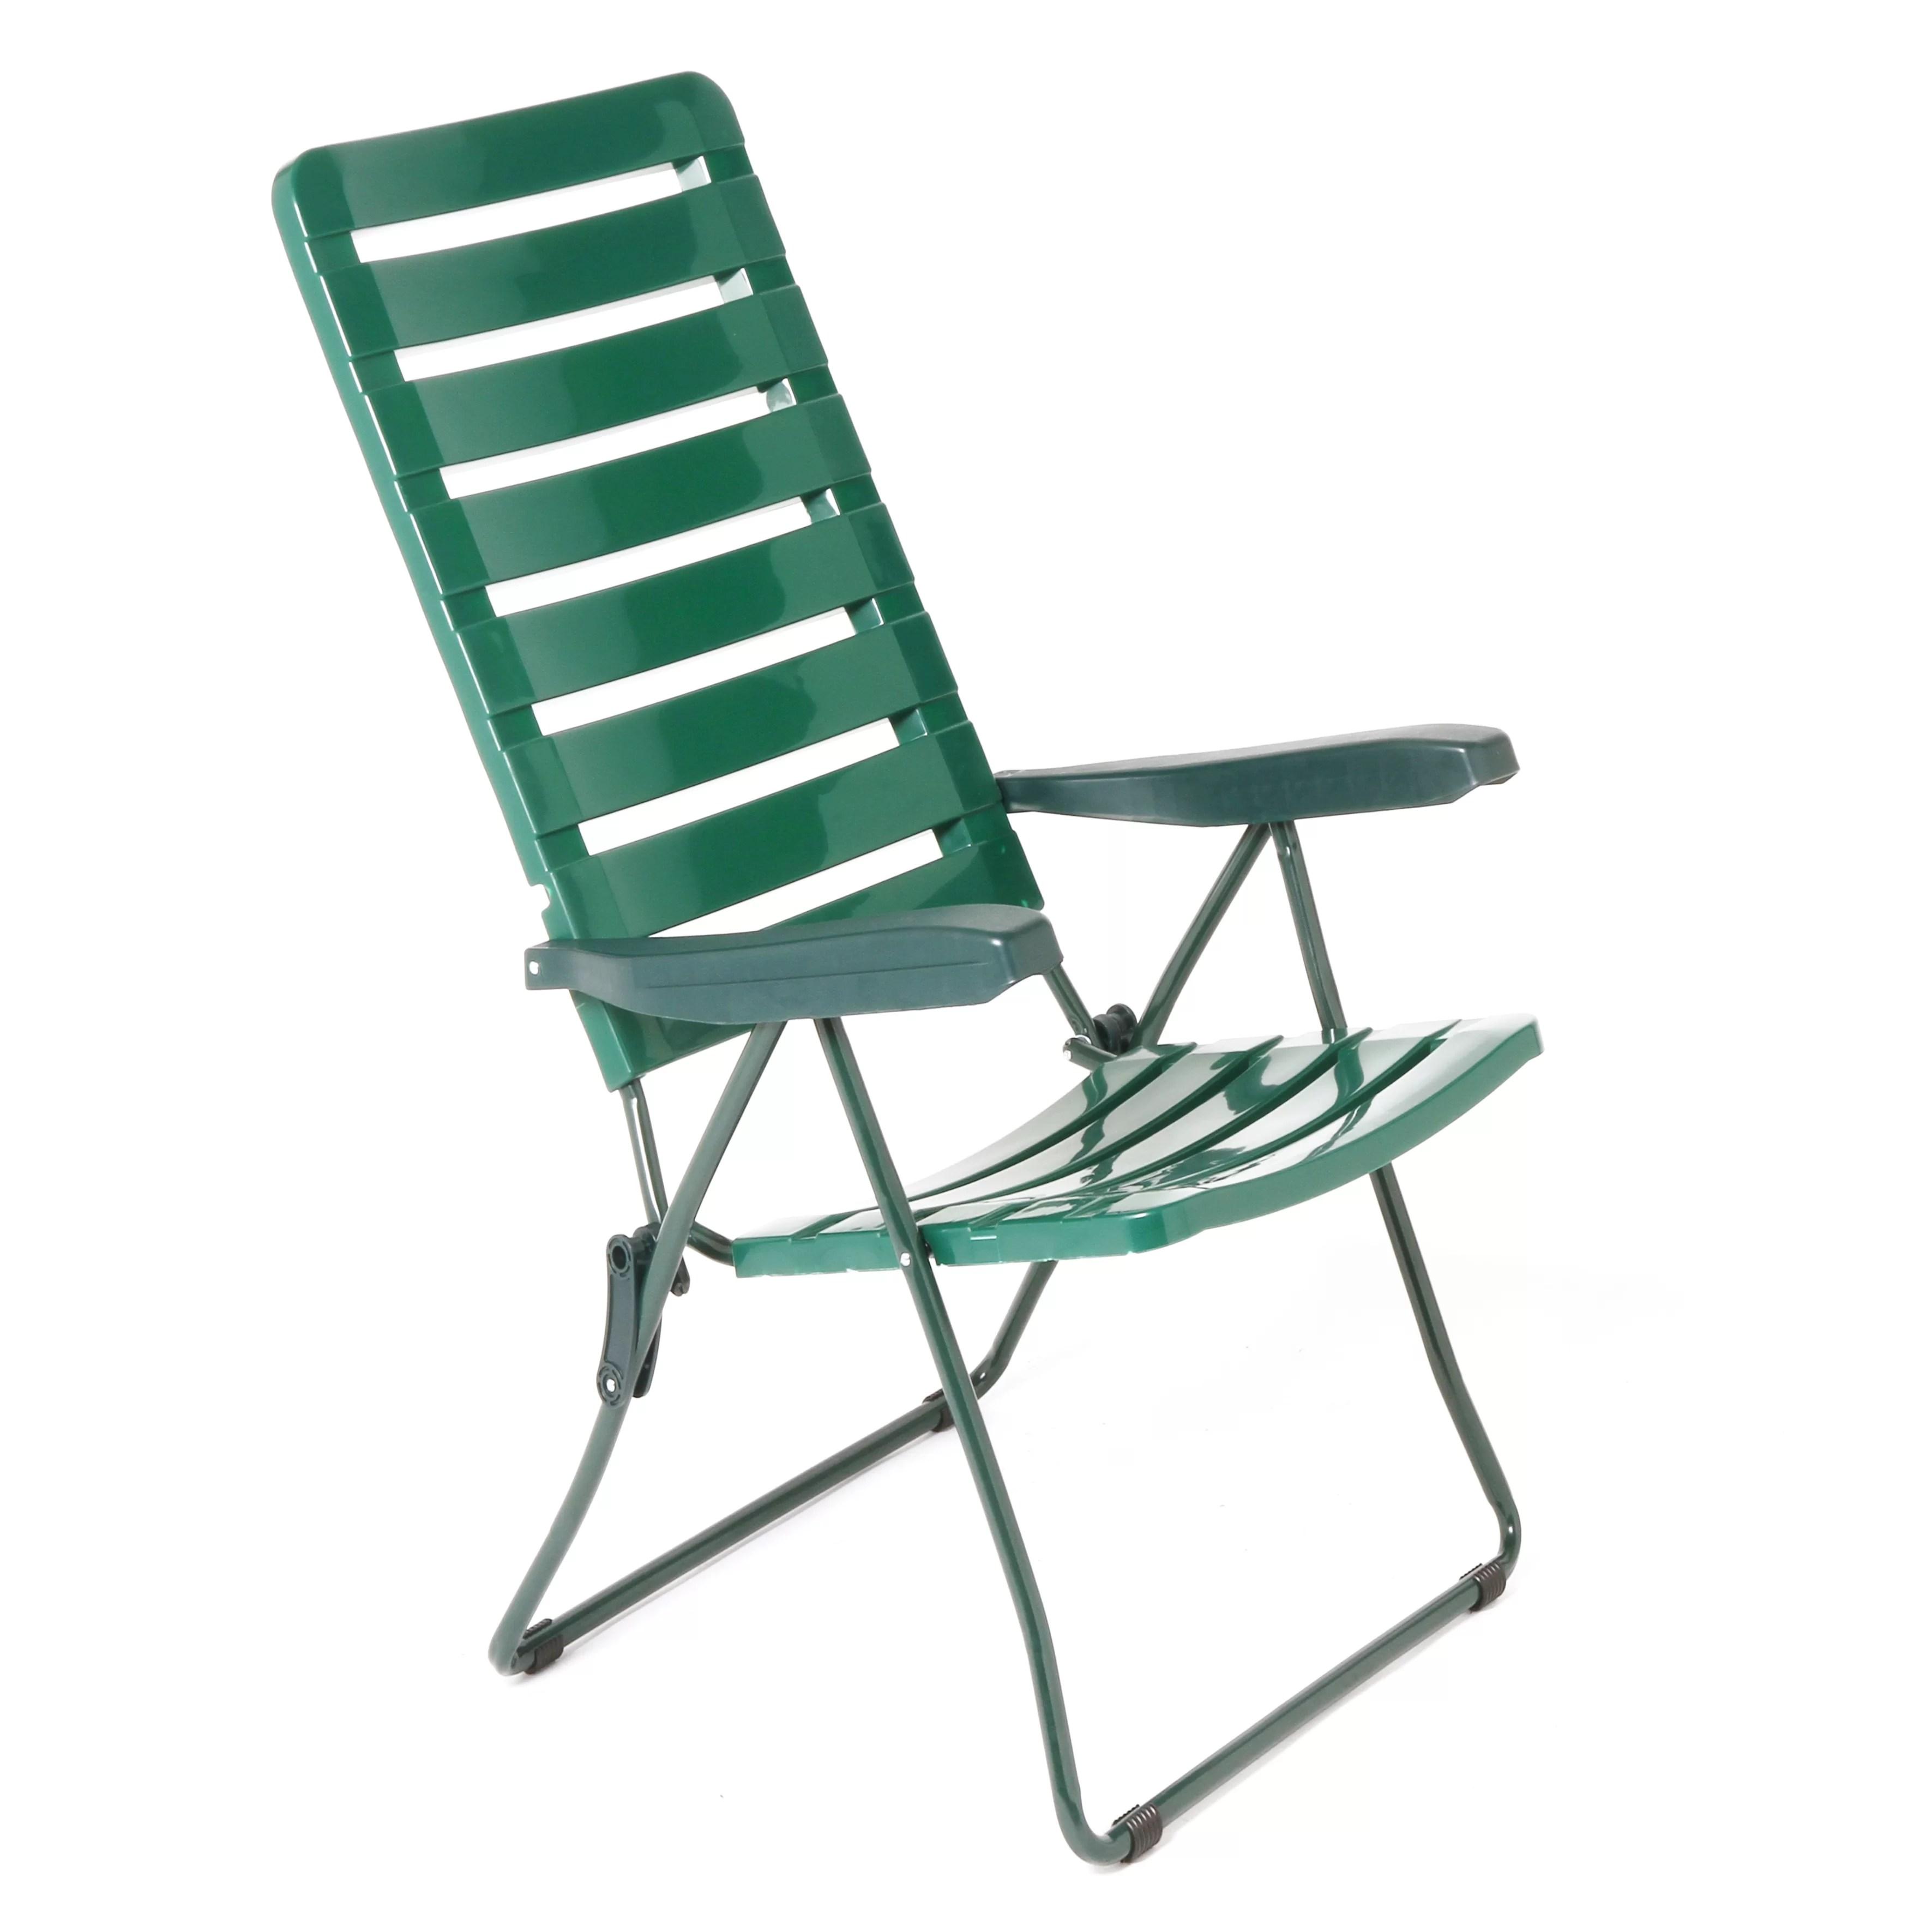 Swift Garden Furniture Mexico Folding Recliner Arm Chair